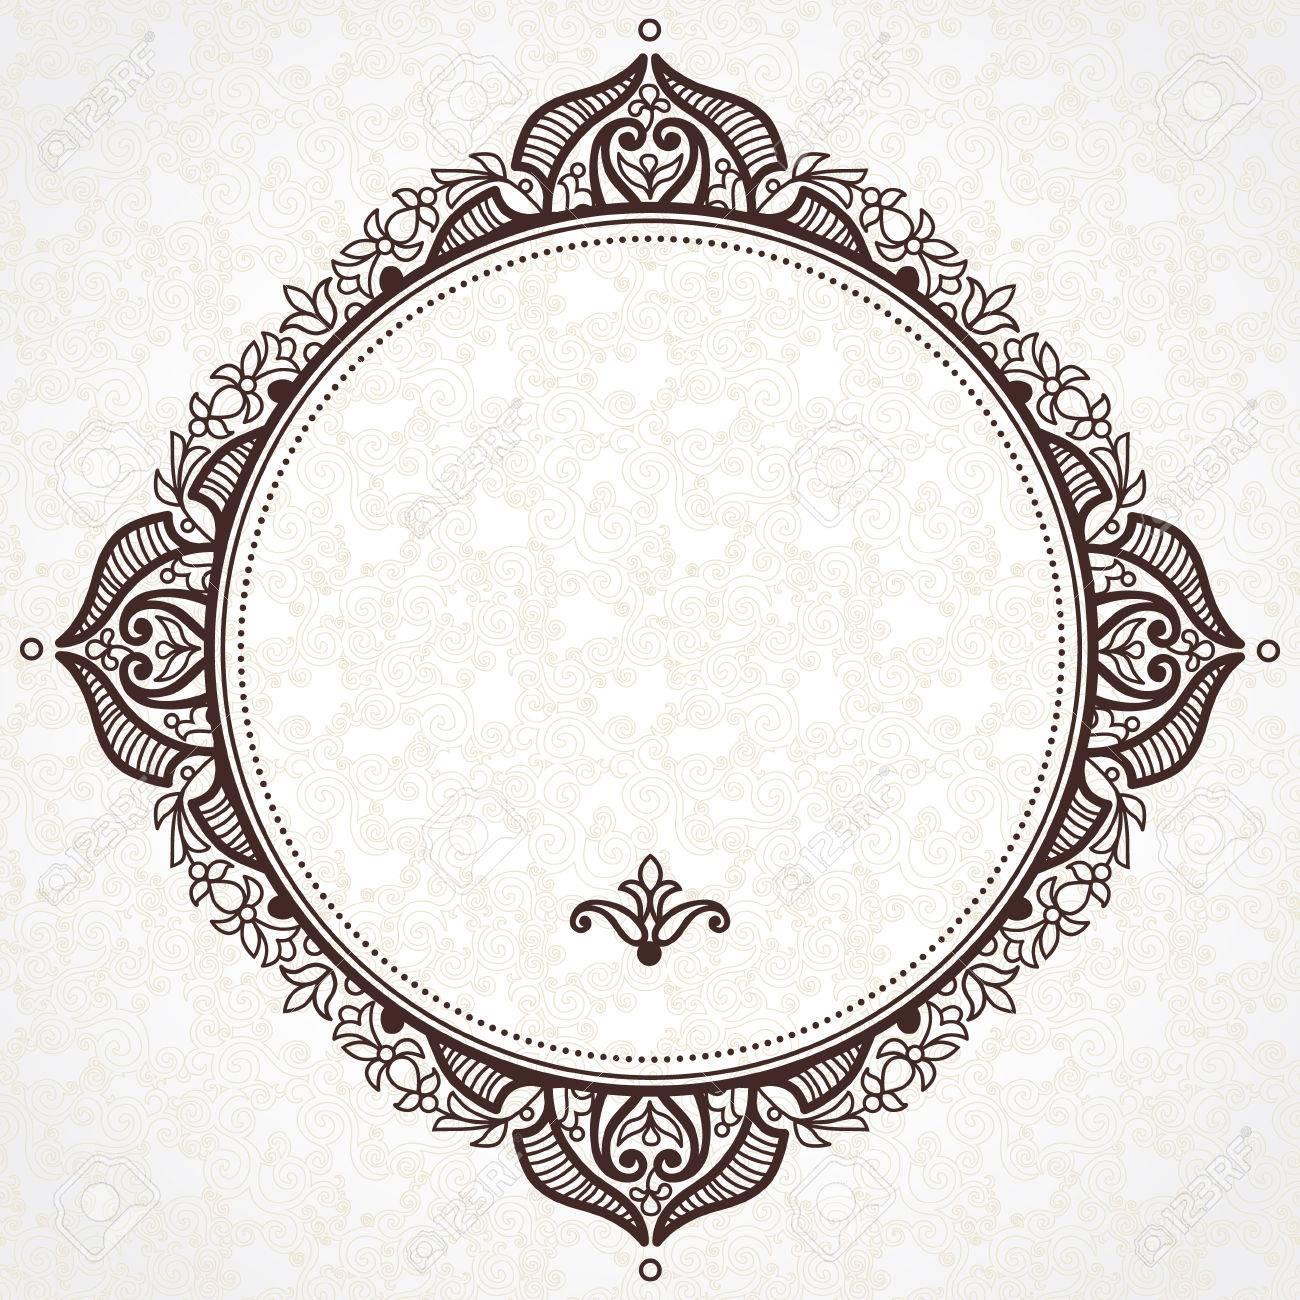 Islamic Frame Stock Photos. Royalty Free Islamic Frame Images